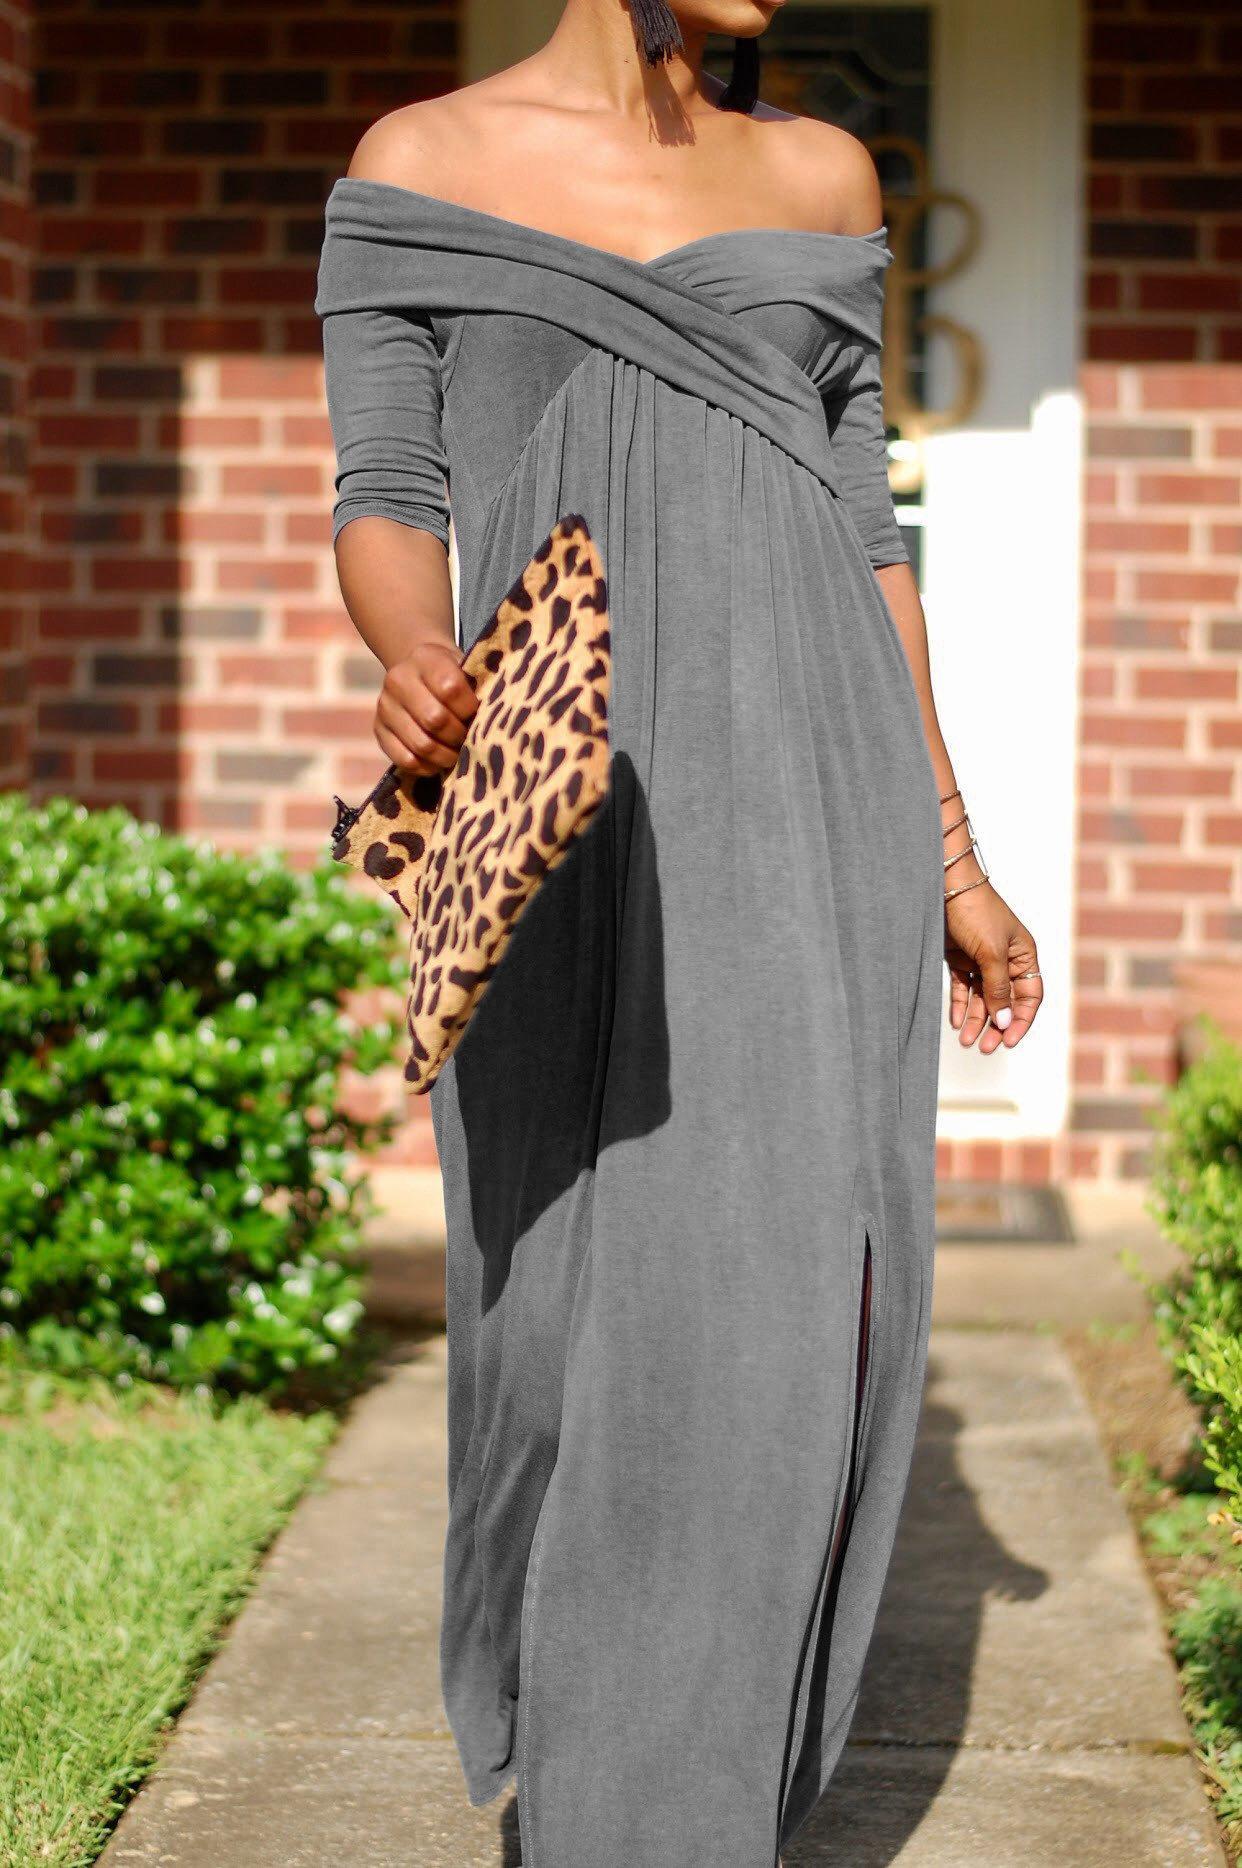 727d3db139 US$ 7.5 - Open Shoulder Sexy Twist Chest Plain Maxi Dress 26900-1 -  www.global-lover.com